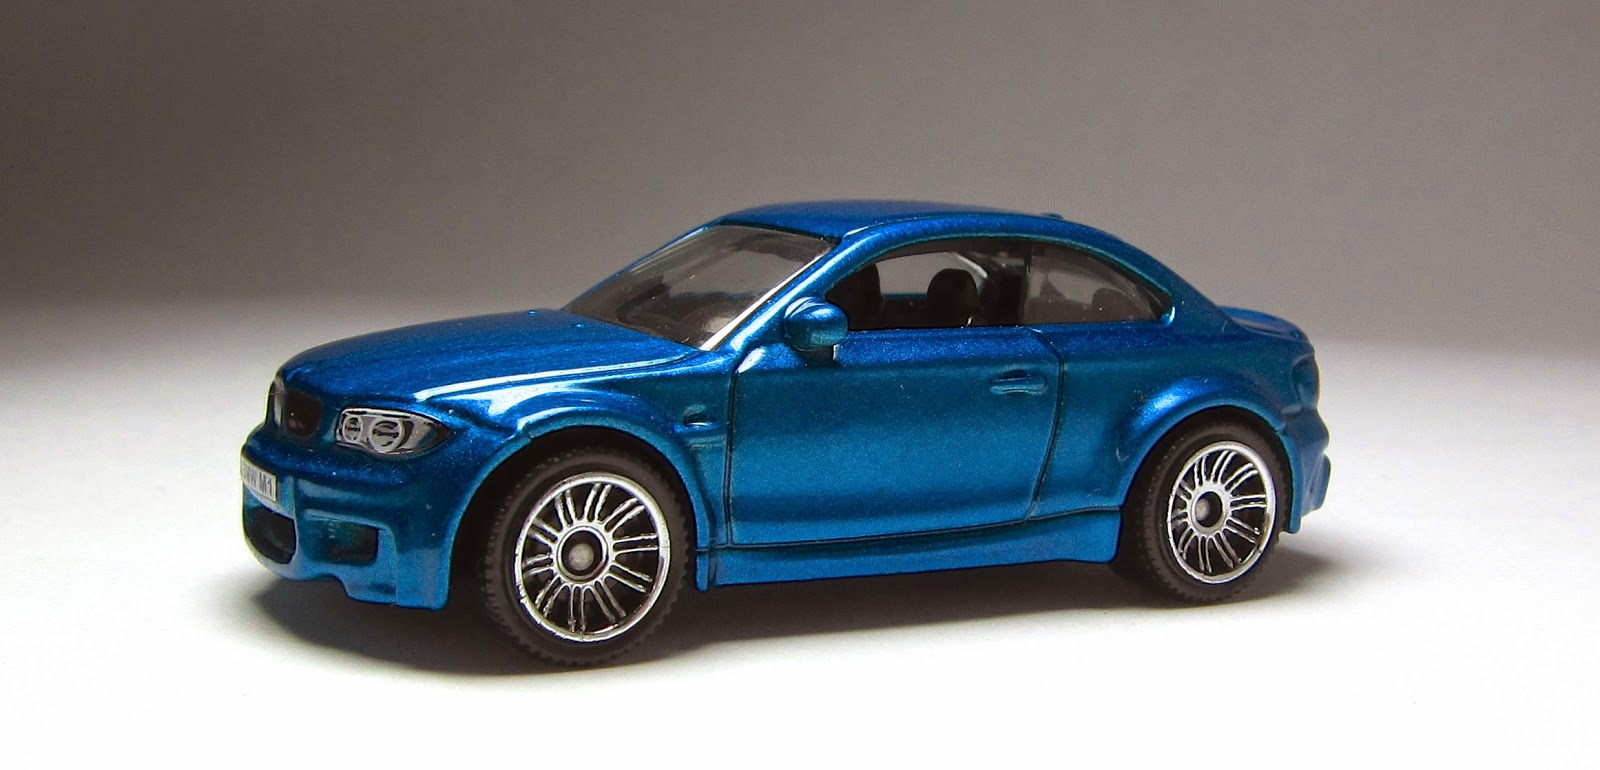 New Matchbox Cars 2015 | Autos Post